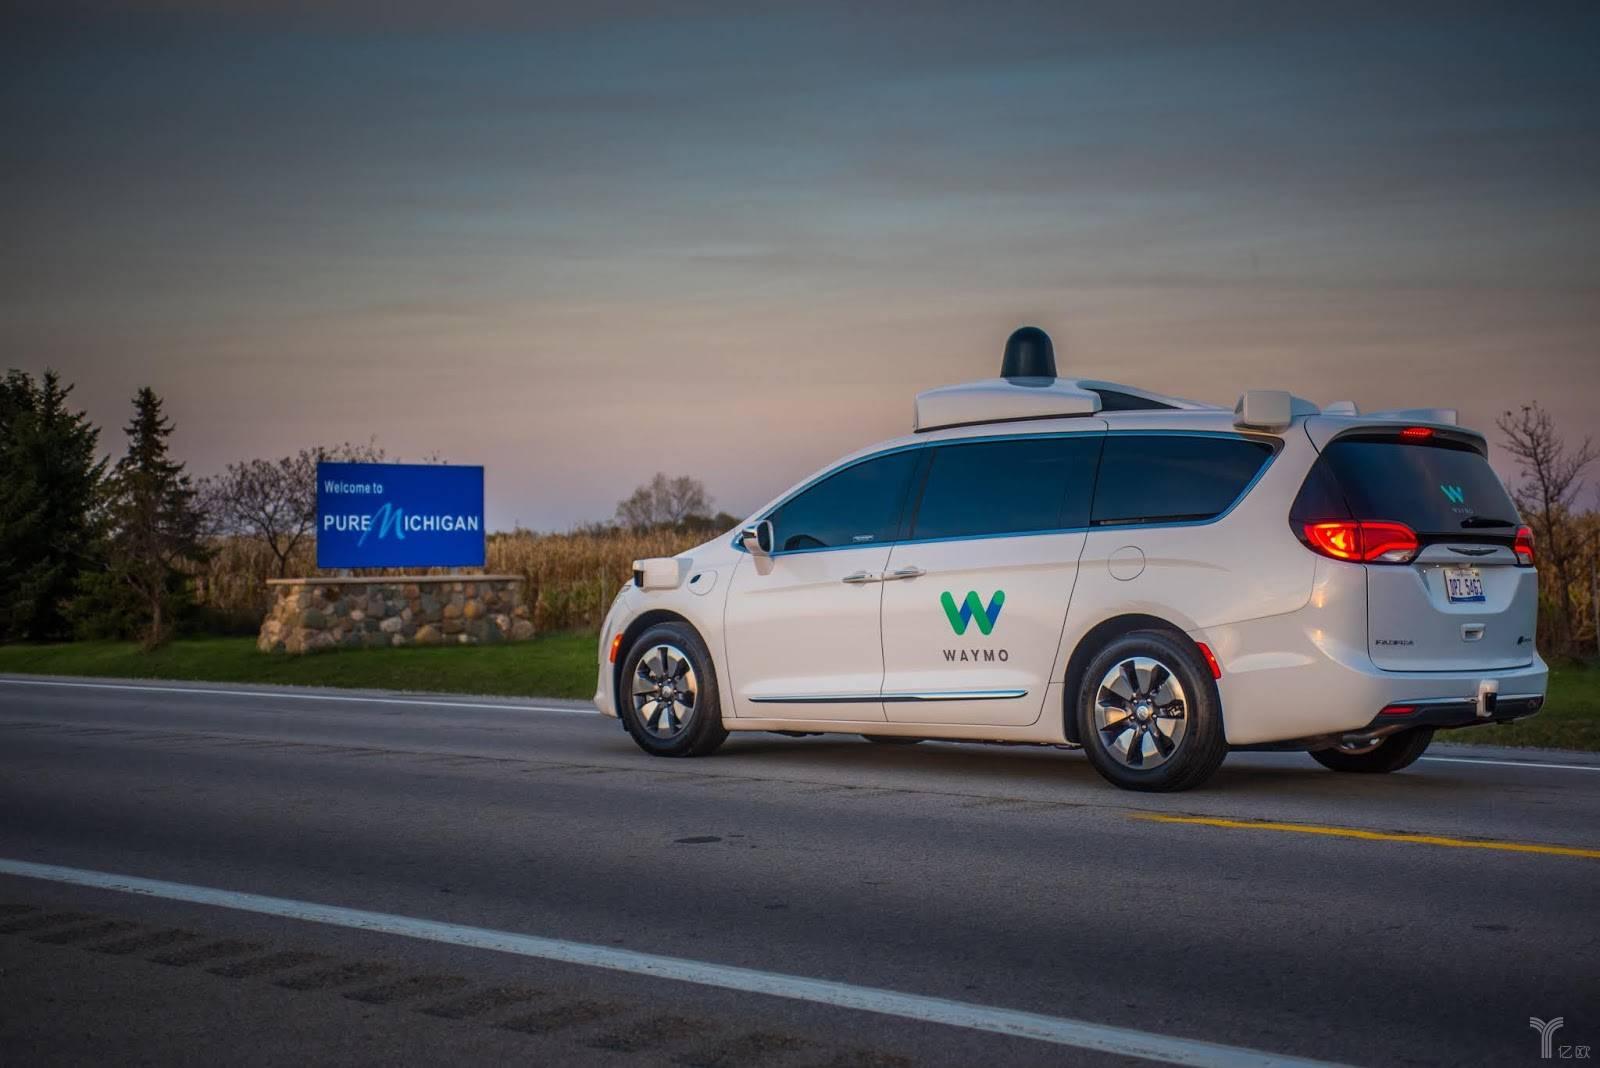 Waymo自动驾驶汽车在开往密歇根的路上